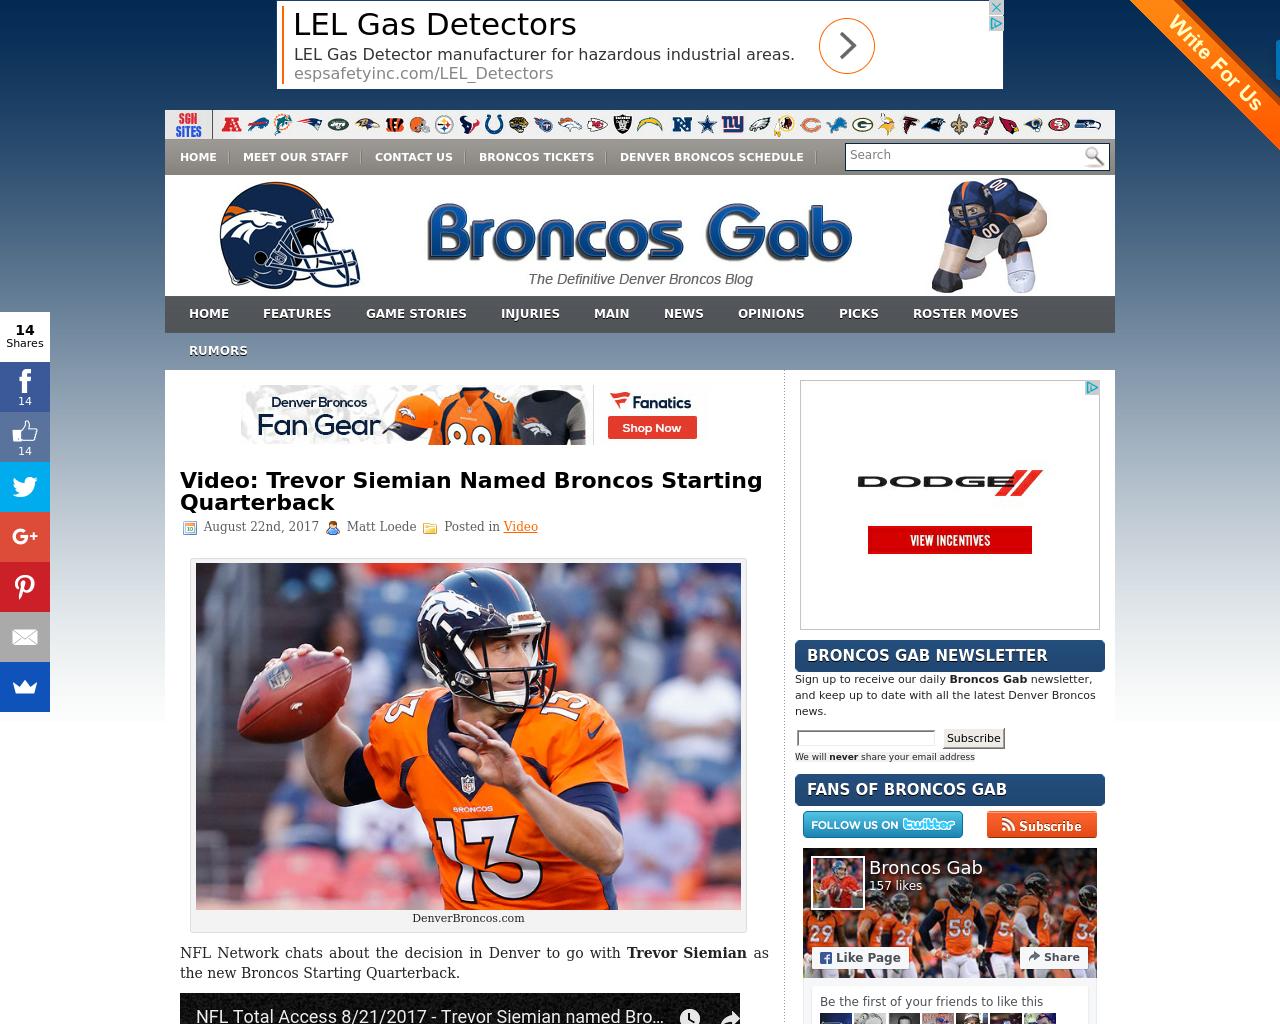 Broncos-Gab-Advertising-Reviews-Pricing